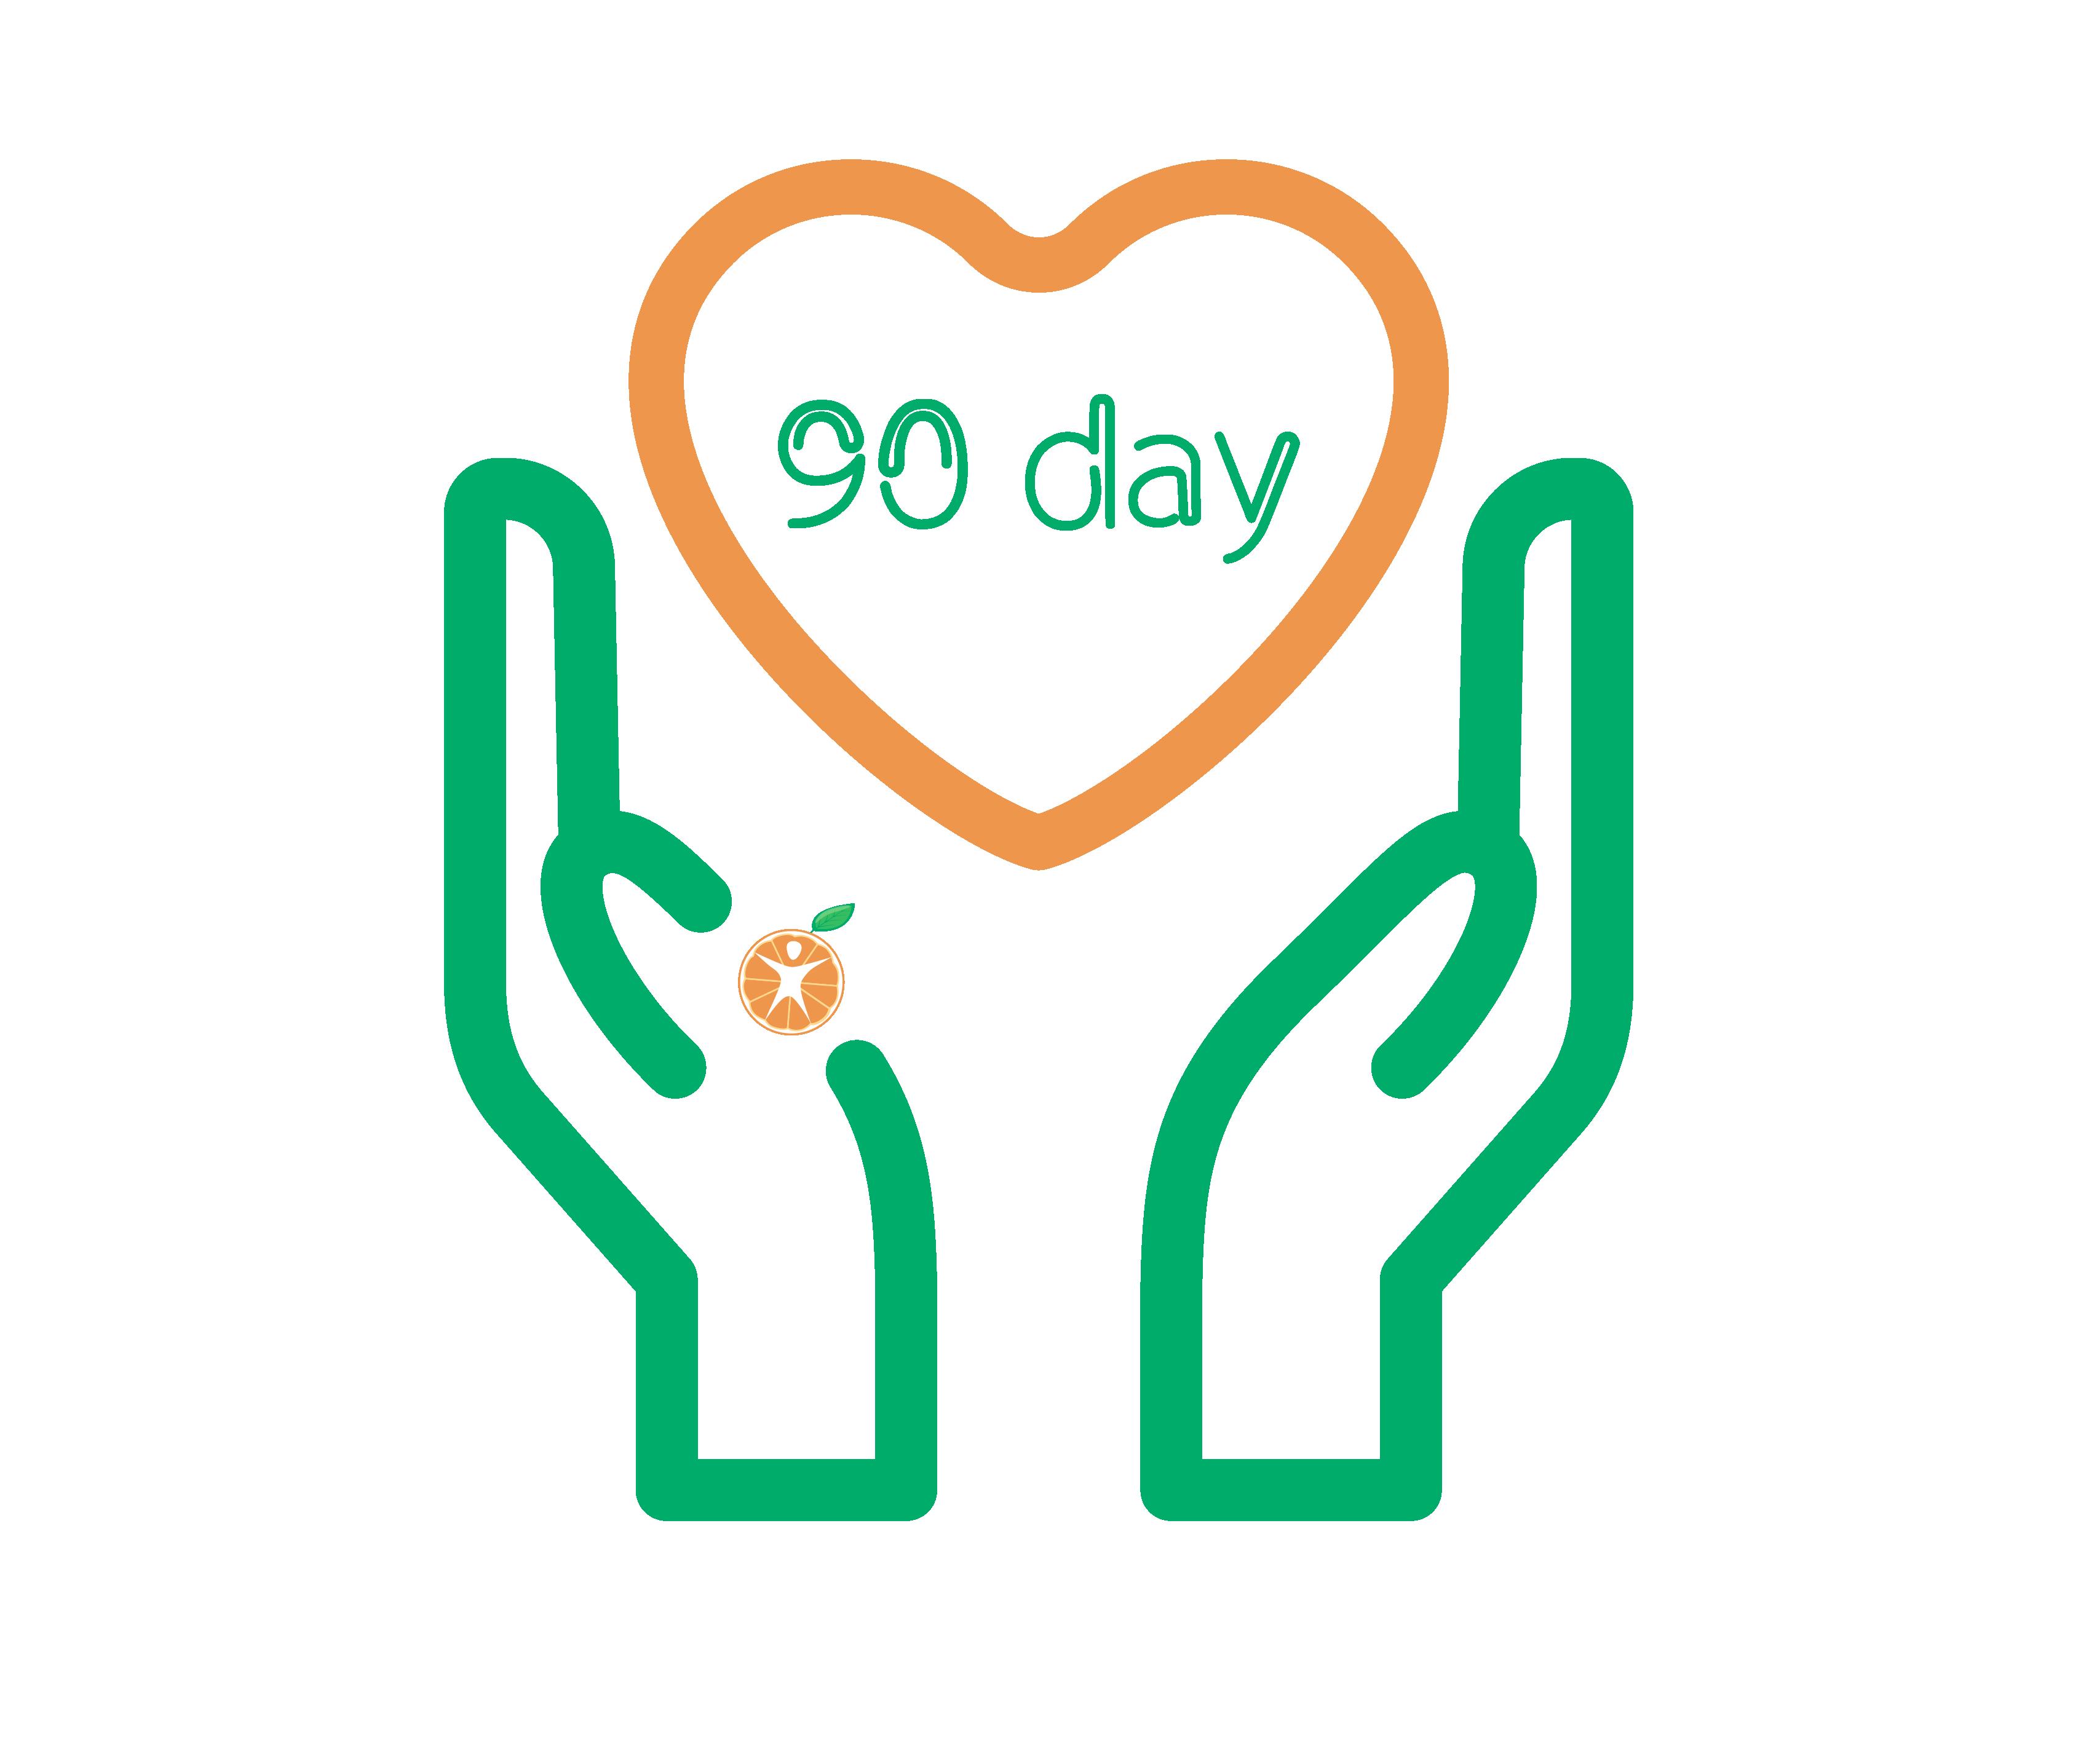 02_90 Day WILDFIT Program (2)